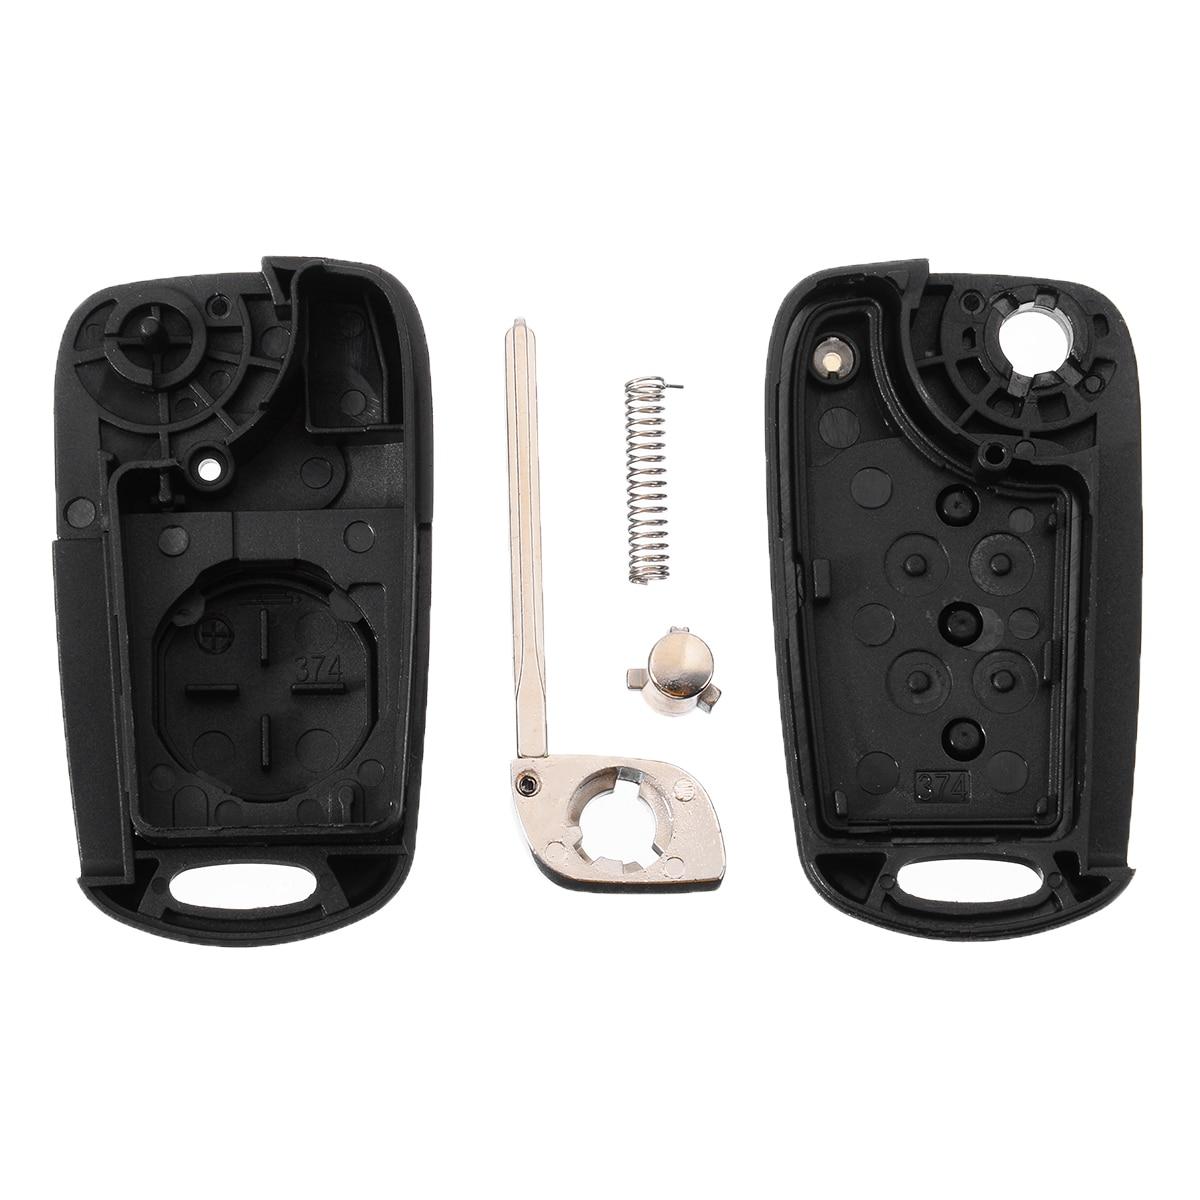 3 Button Car Key Cover Case Remote Key Fob Case Shell Accessories For Kia Ceed Picanto Sportage For Hyundai i20 i30 ix35 4